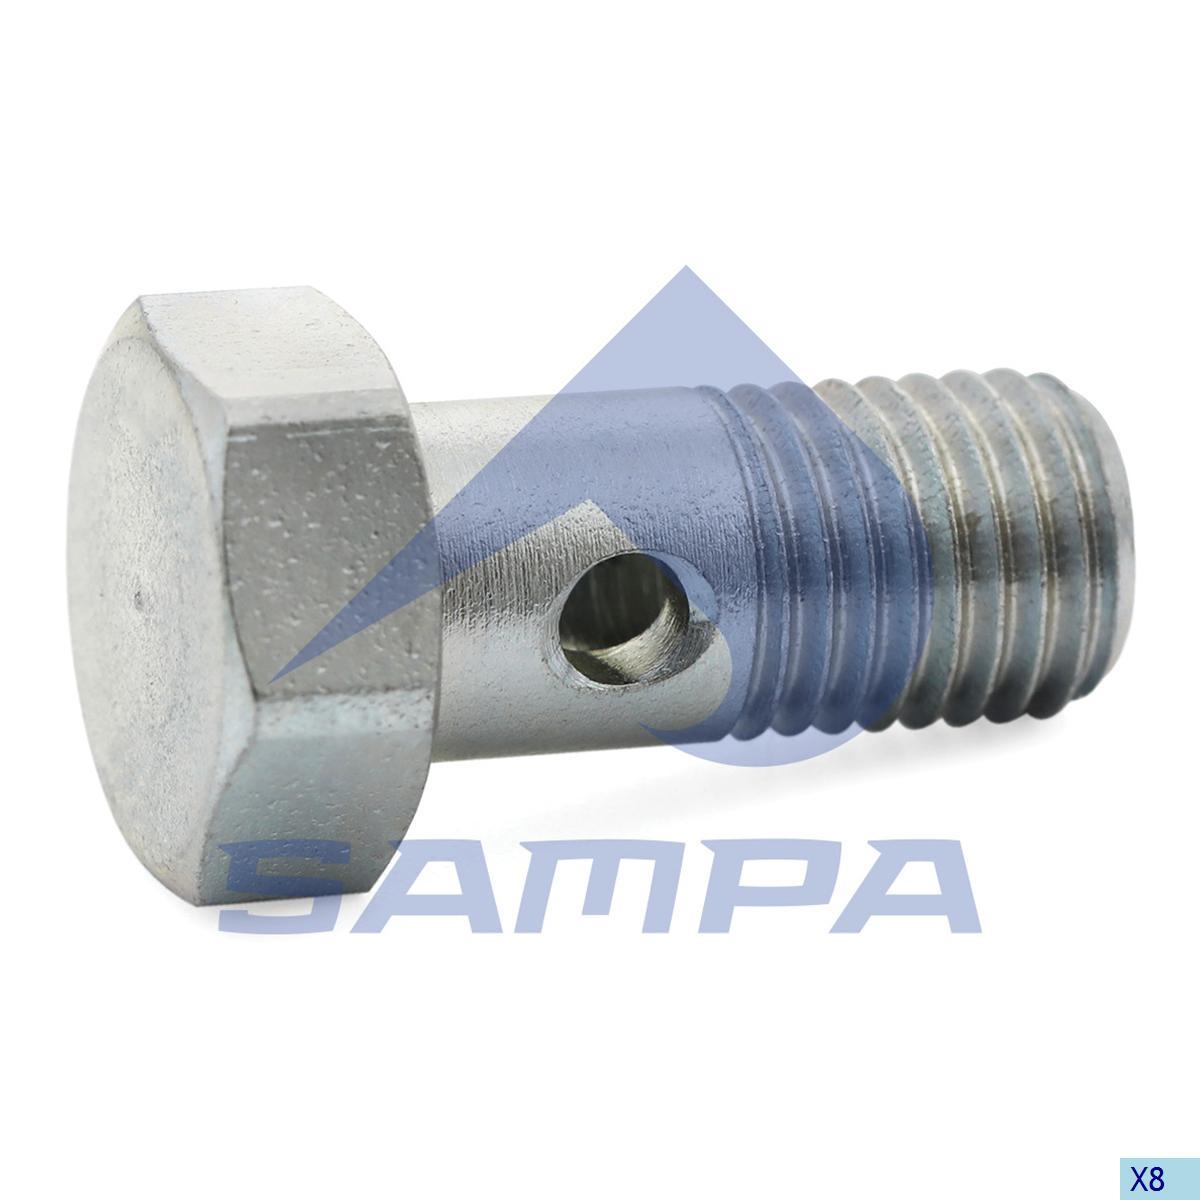 Screw, Injector, Daf, Engine